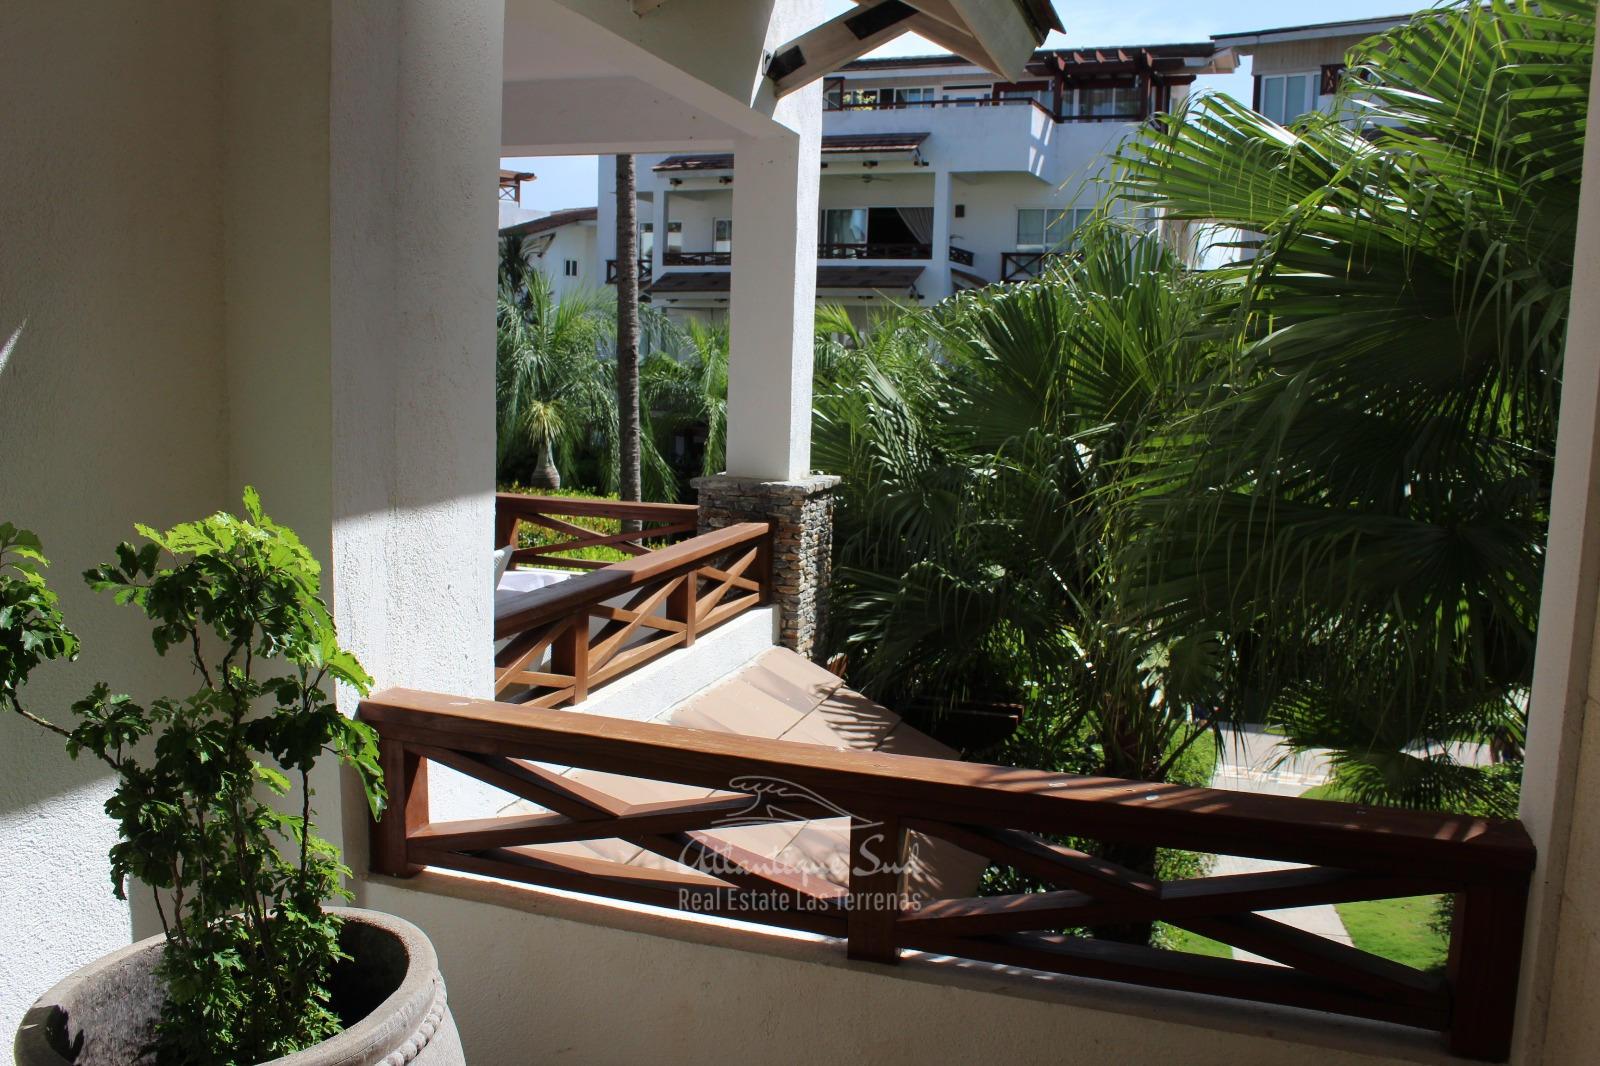 Apartments near the beach real estate las terrenas dominican republic30.jpg